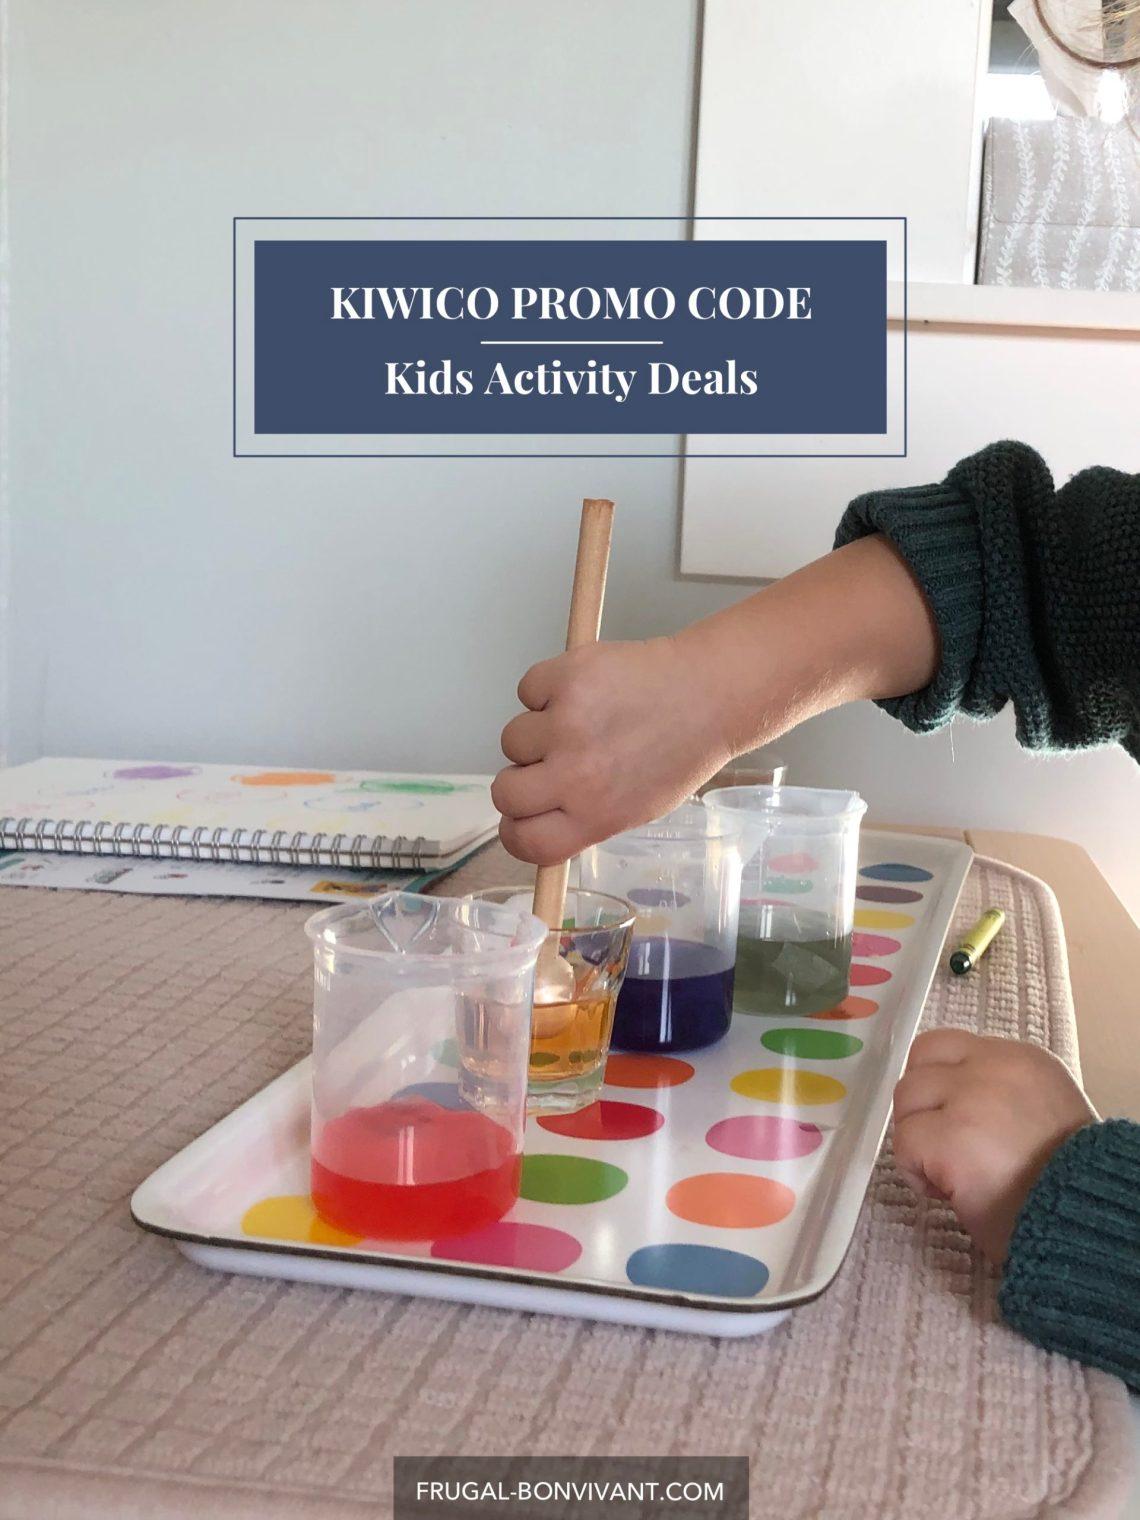 KiwiCo Promo Code - Kiwi Crate subscription boxes